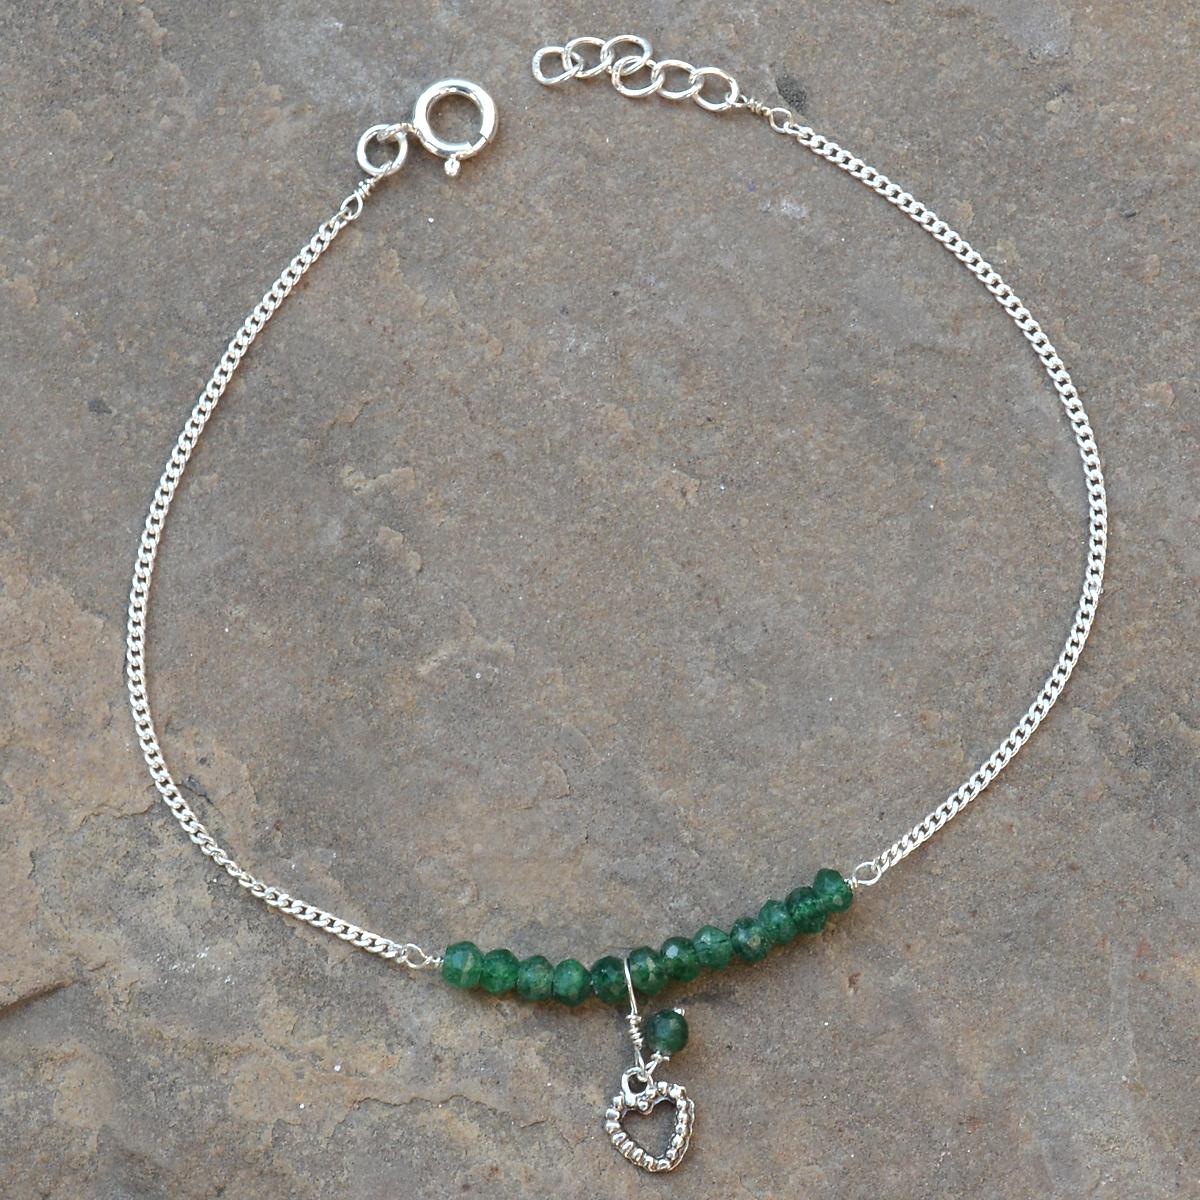 Green Aventurine Gemstone Sterling Silver Anklet PG-155898